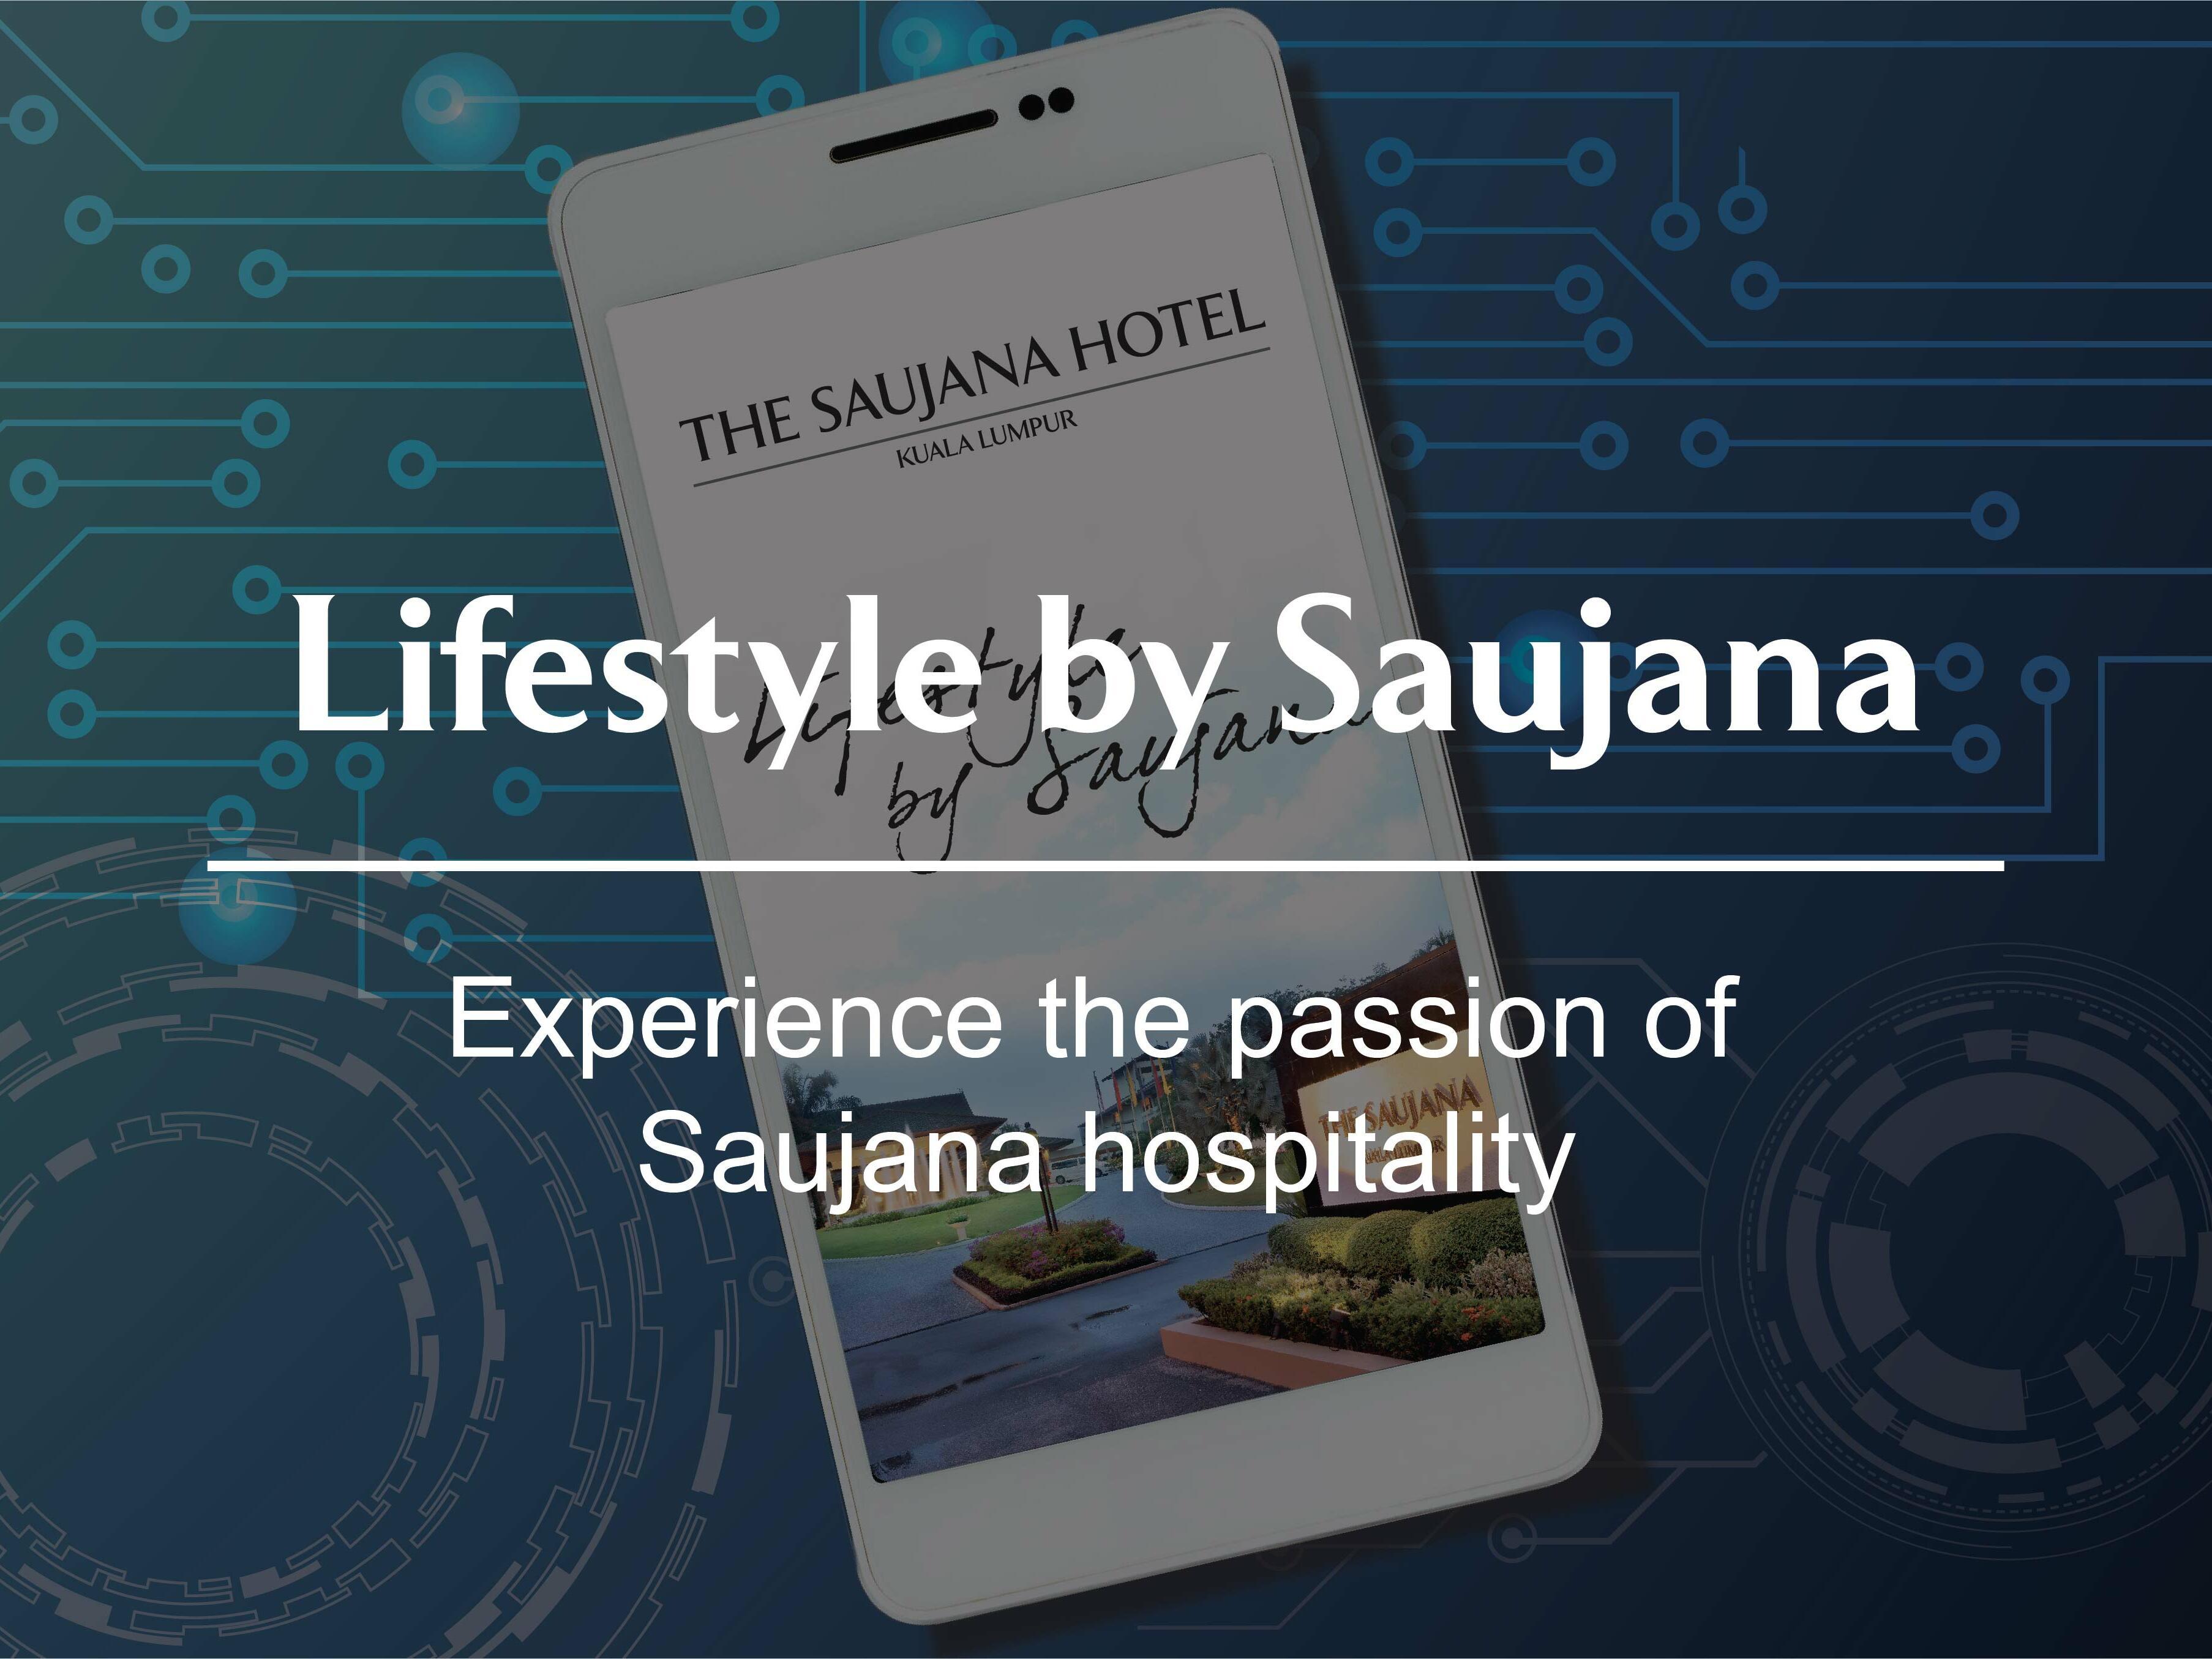 A poster of Life style by Saujana at The Saujana Hotel Kuala Lumpur